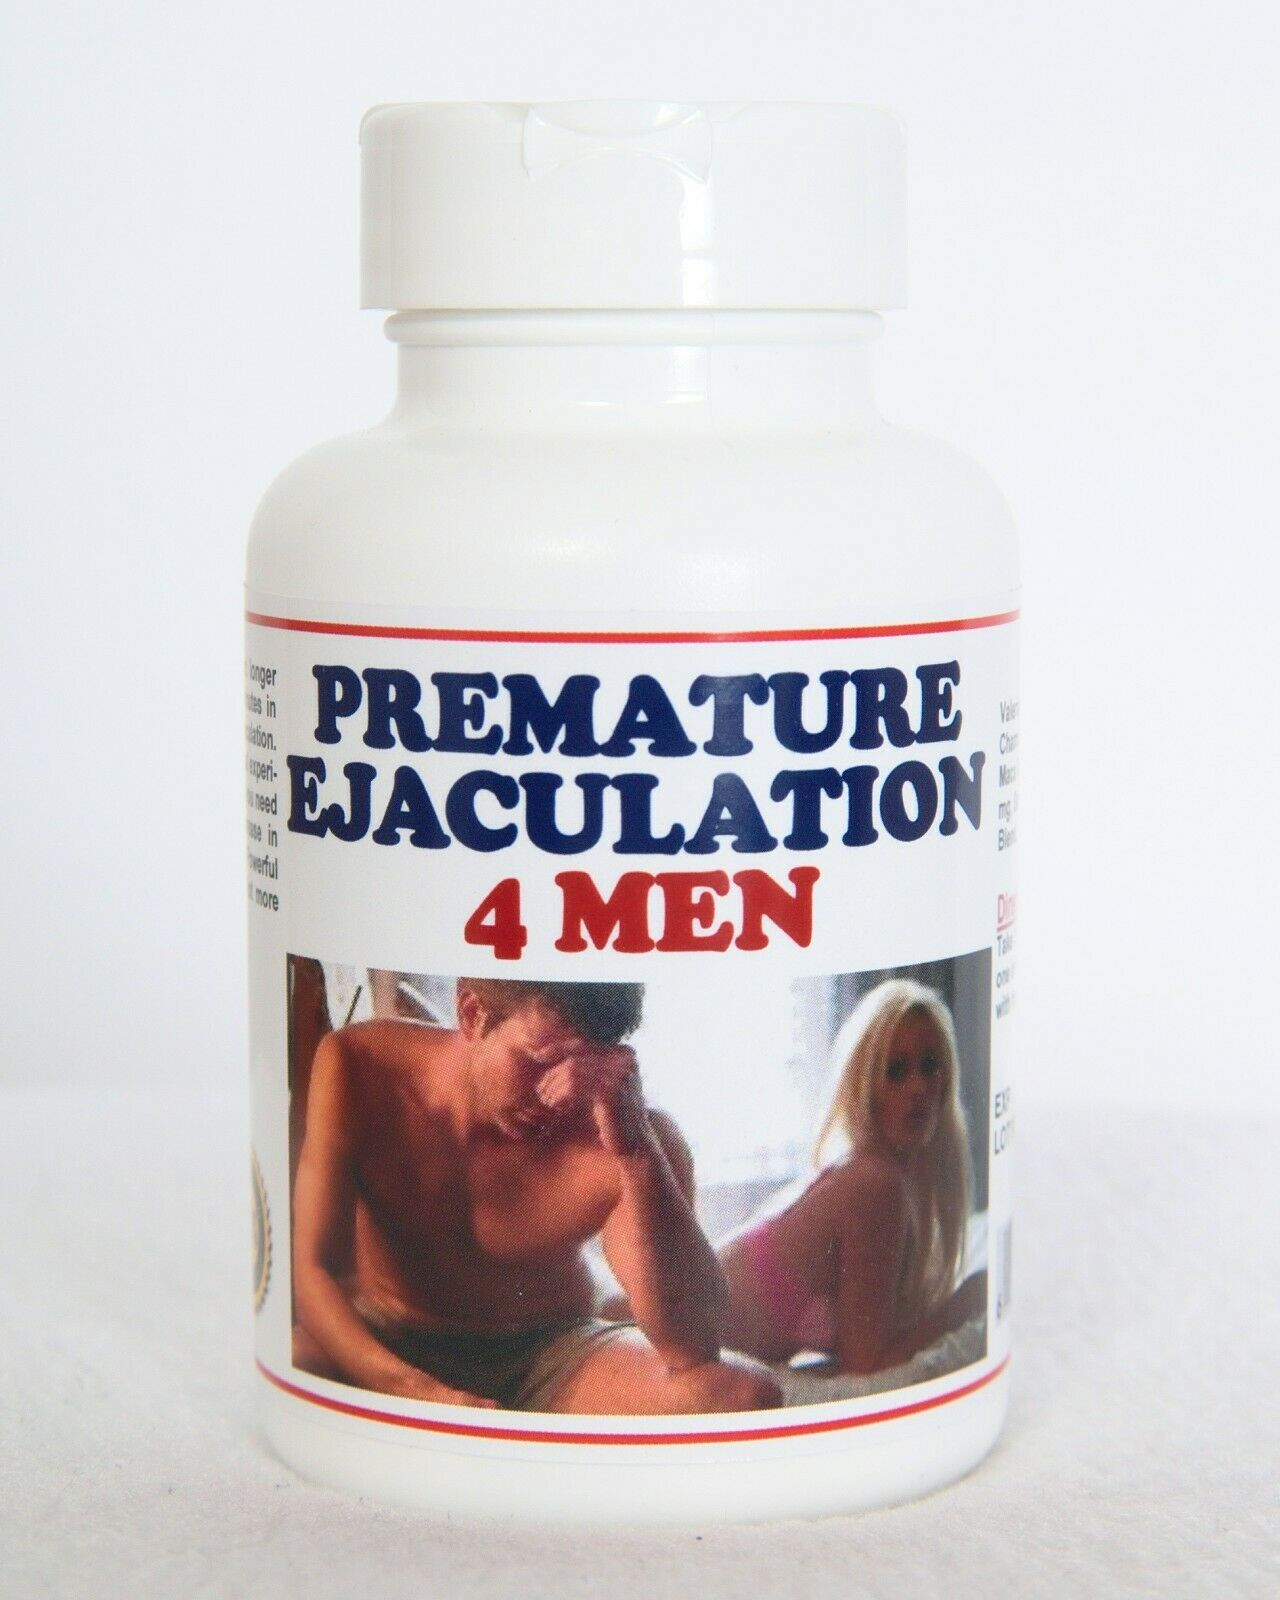 PREMATURE EJACULATION FOR MEN  To treat & Prevent